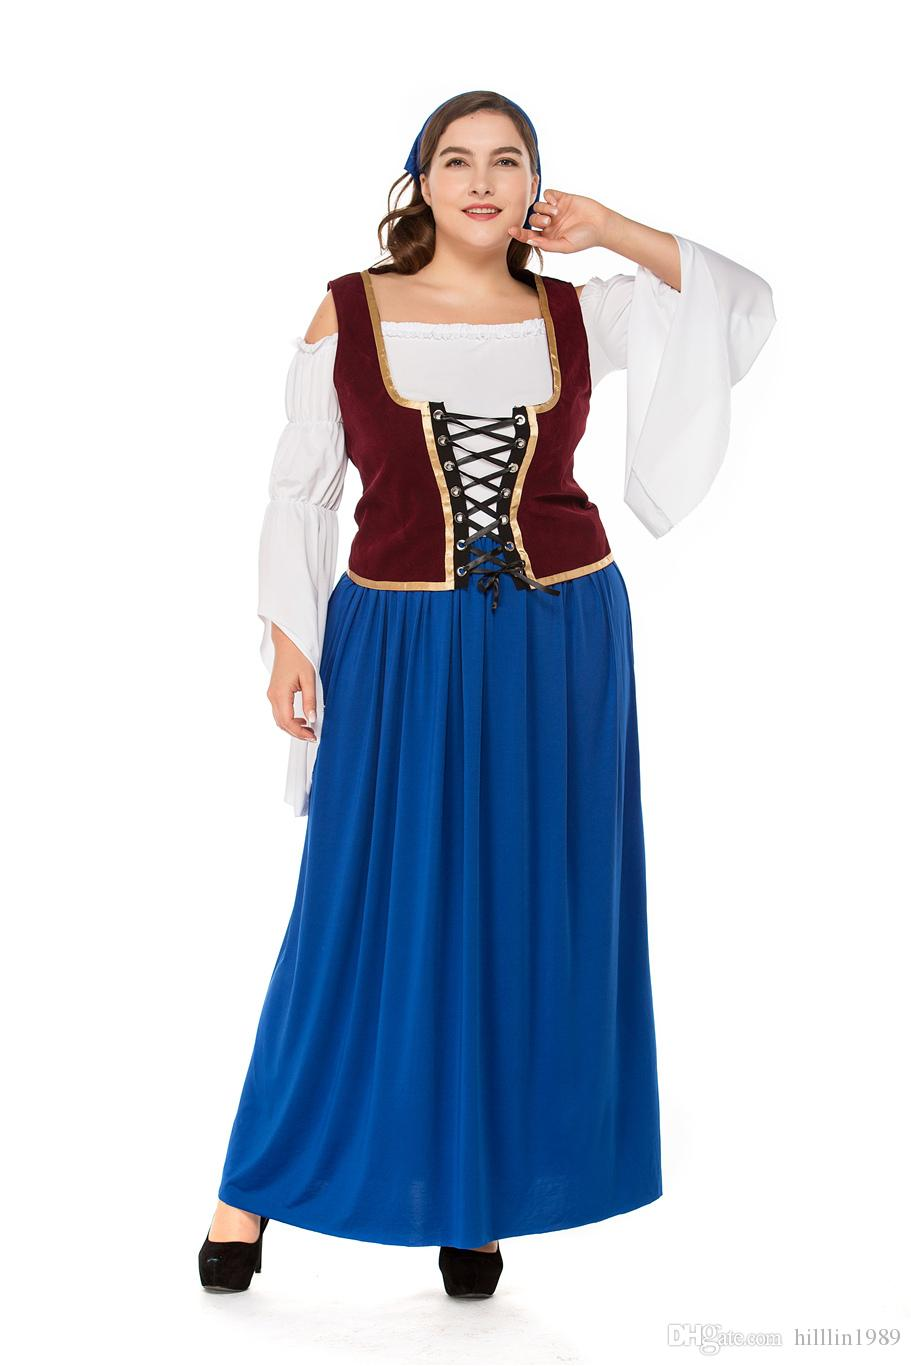 Plus Size German Women Oktoberfest Dress Mardi Gras Blue Cosplay Bavarian  Waitress Costume Carnival Large Size Beer Girl Fancy Dress Kids Costume ...